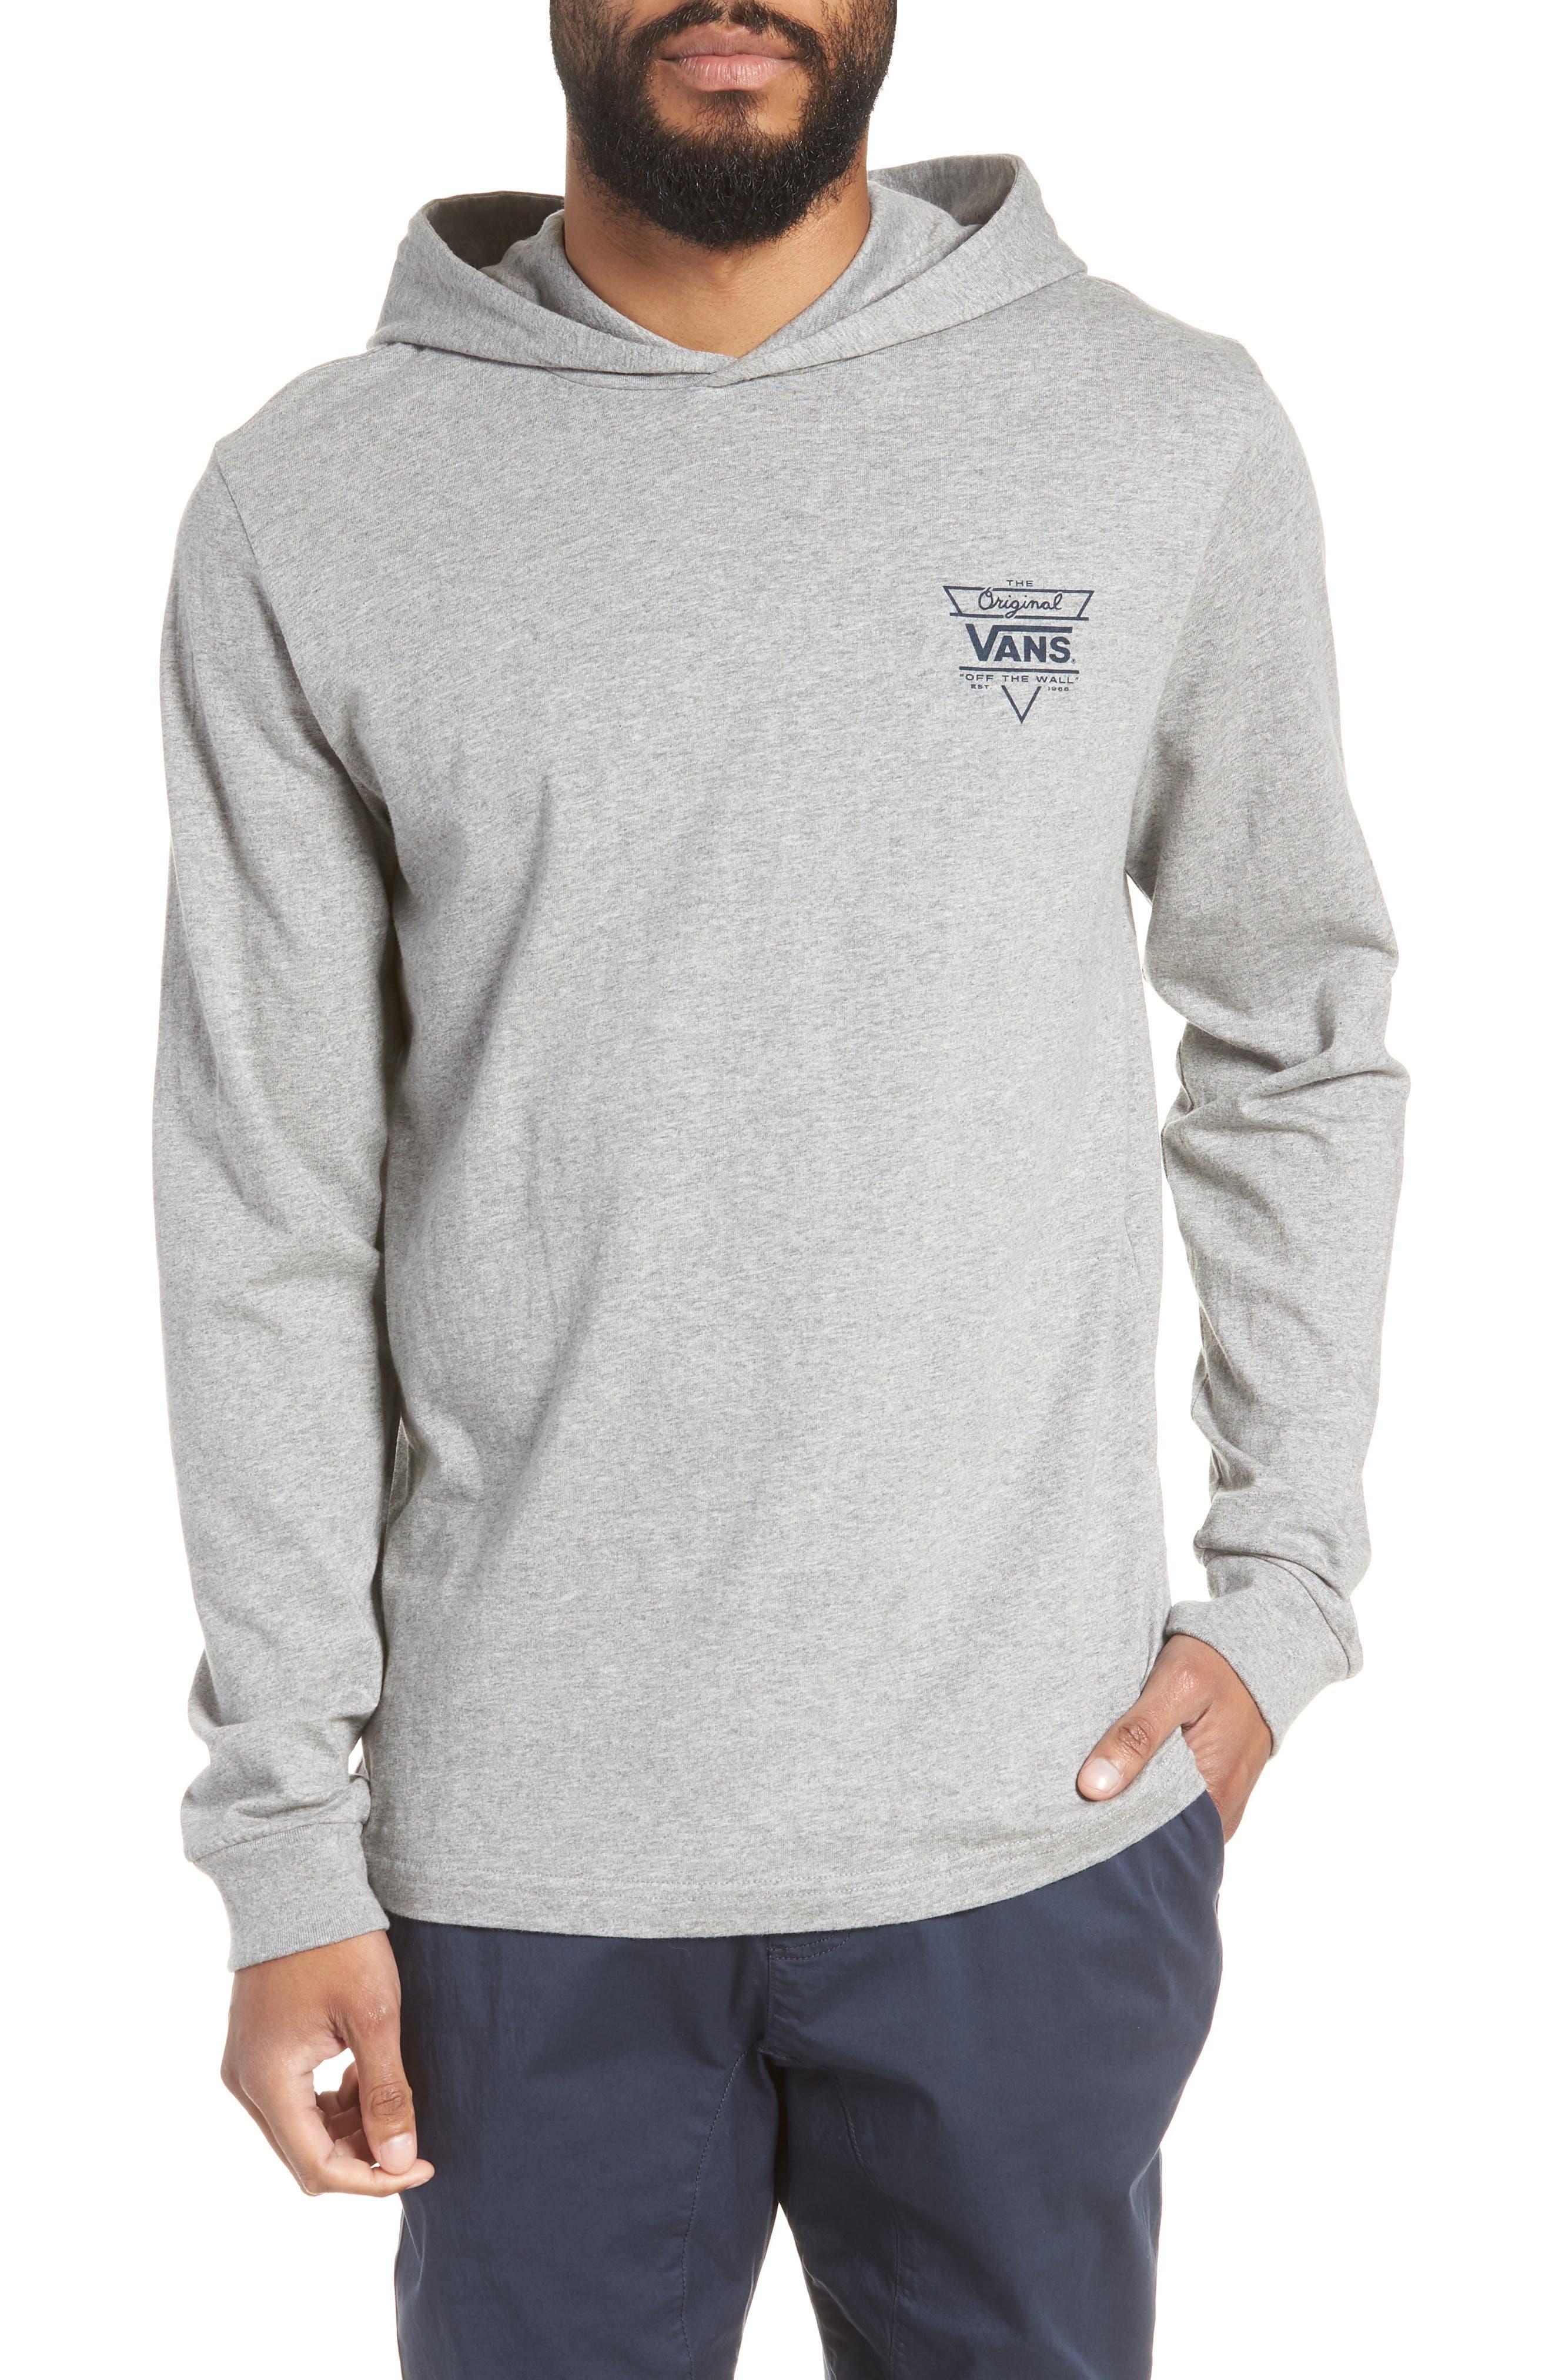 Van Doren Hooded T-Shirt,                             Main thumbnail 1, color,                             Cement Heather/ Dress Blues